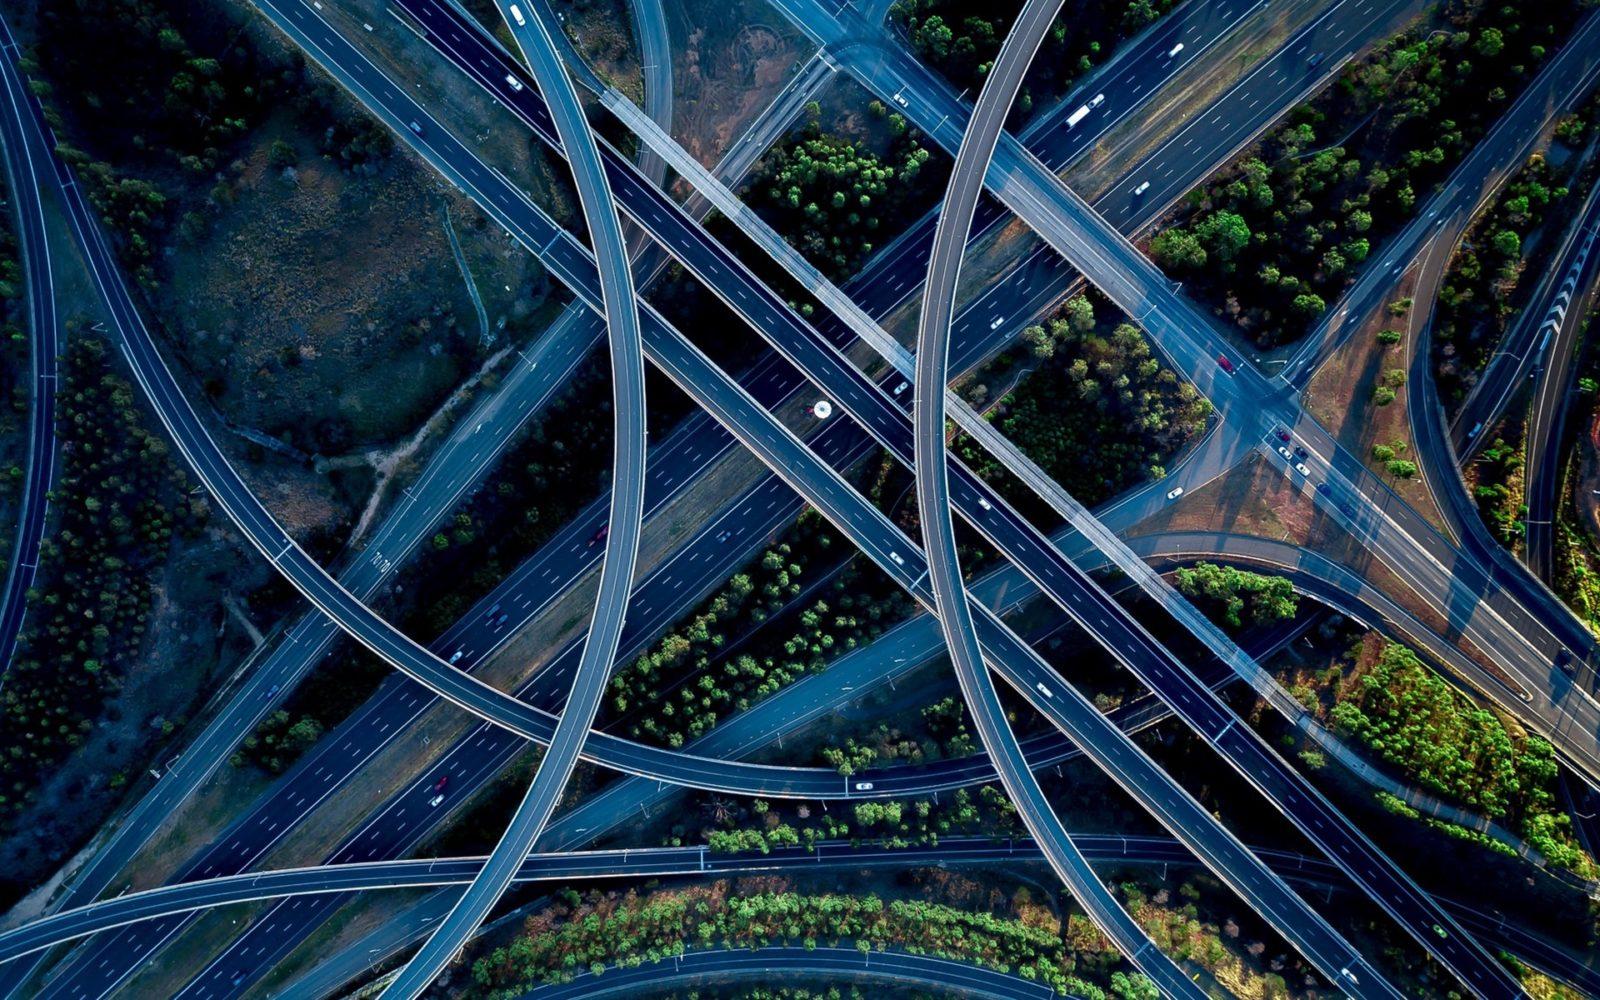 Top view crossroads roads overpass 1920x1200 - Затмения. Теоретические основы и эзотерические смыслы